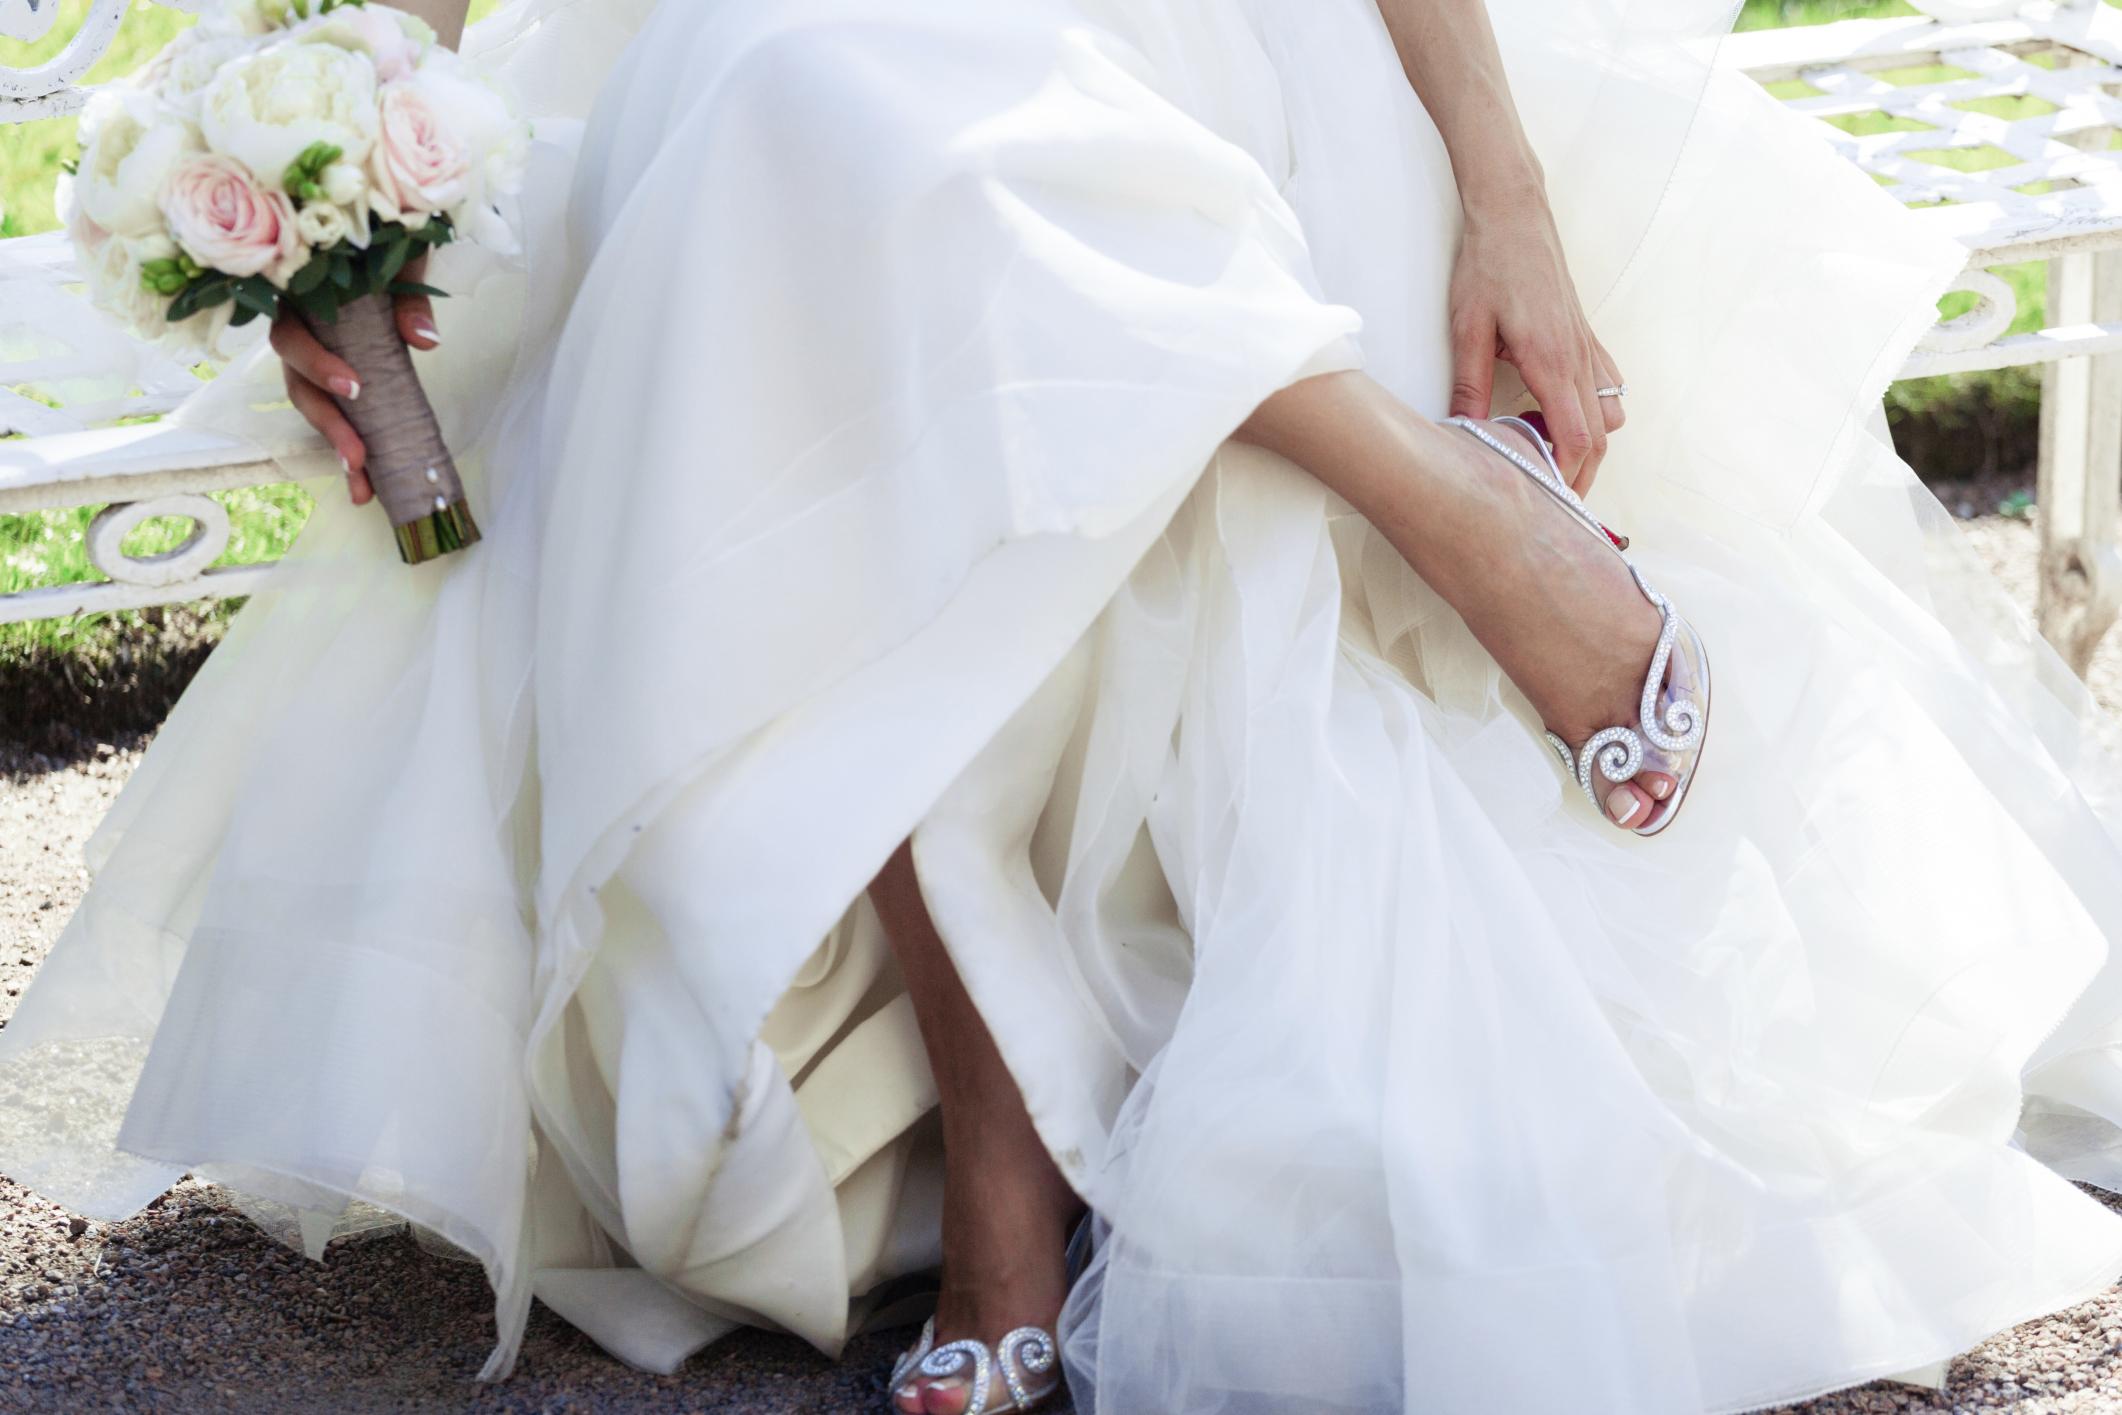 shoes for a wedding dress 1 - حل مشکل کفش پاشنه بلند برای عروس خانم ها